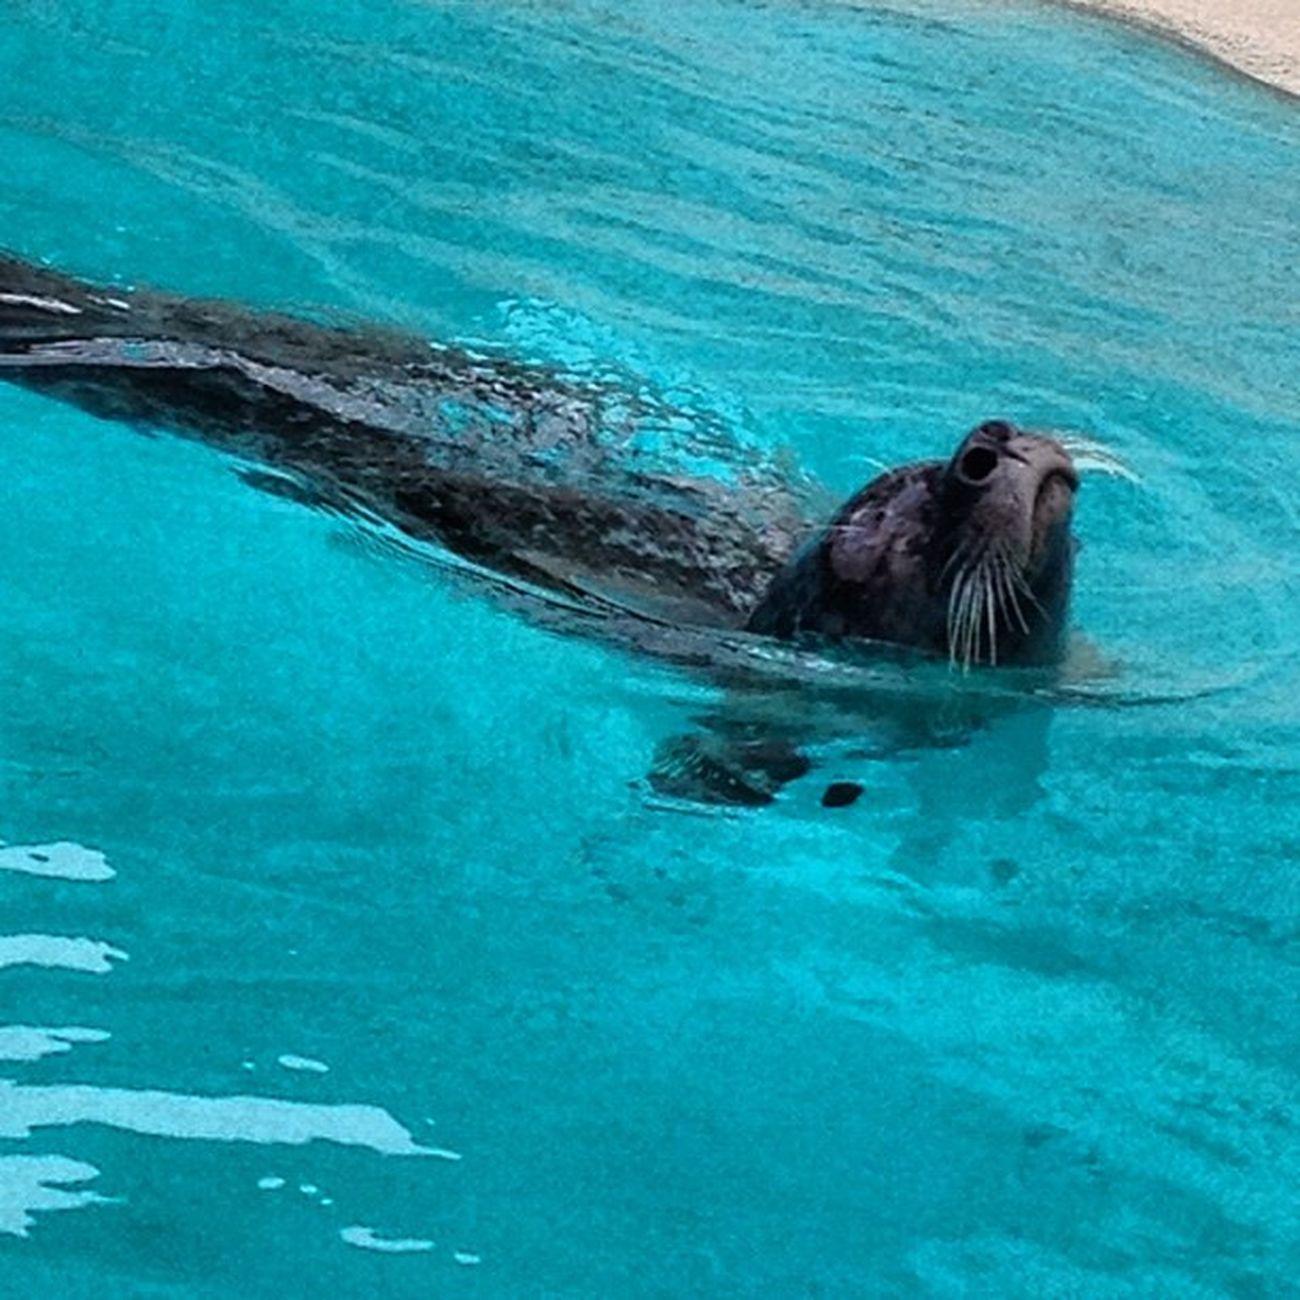 #tierpark #seelöwe #zoo #sealion Zoo Sealion  Tierpark Seelöwe